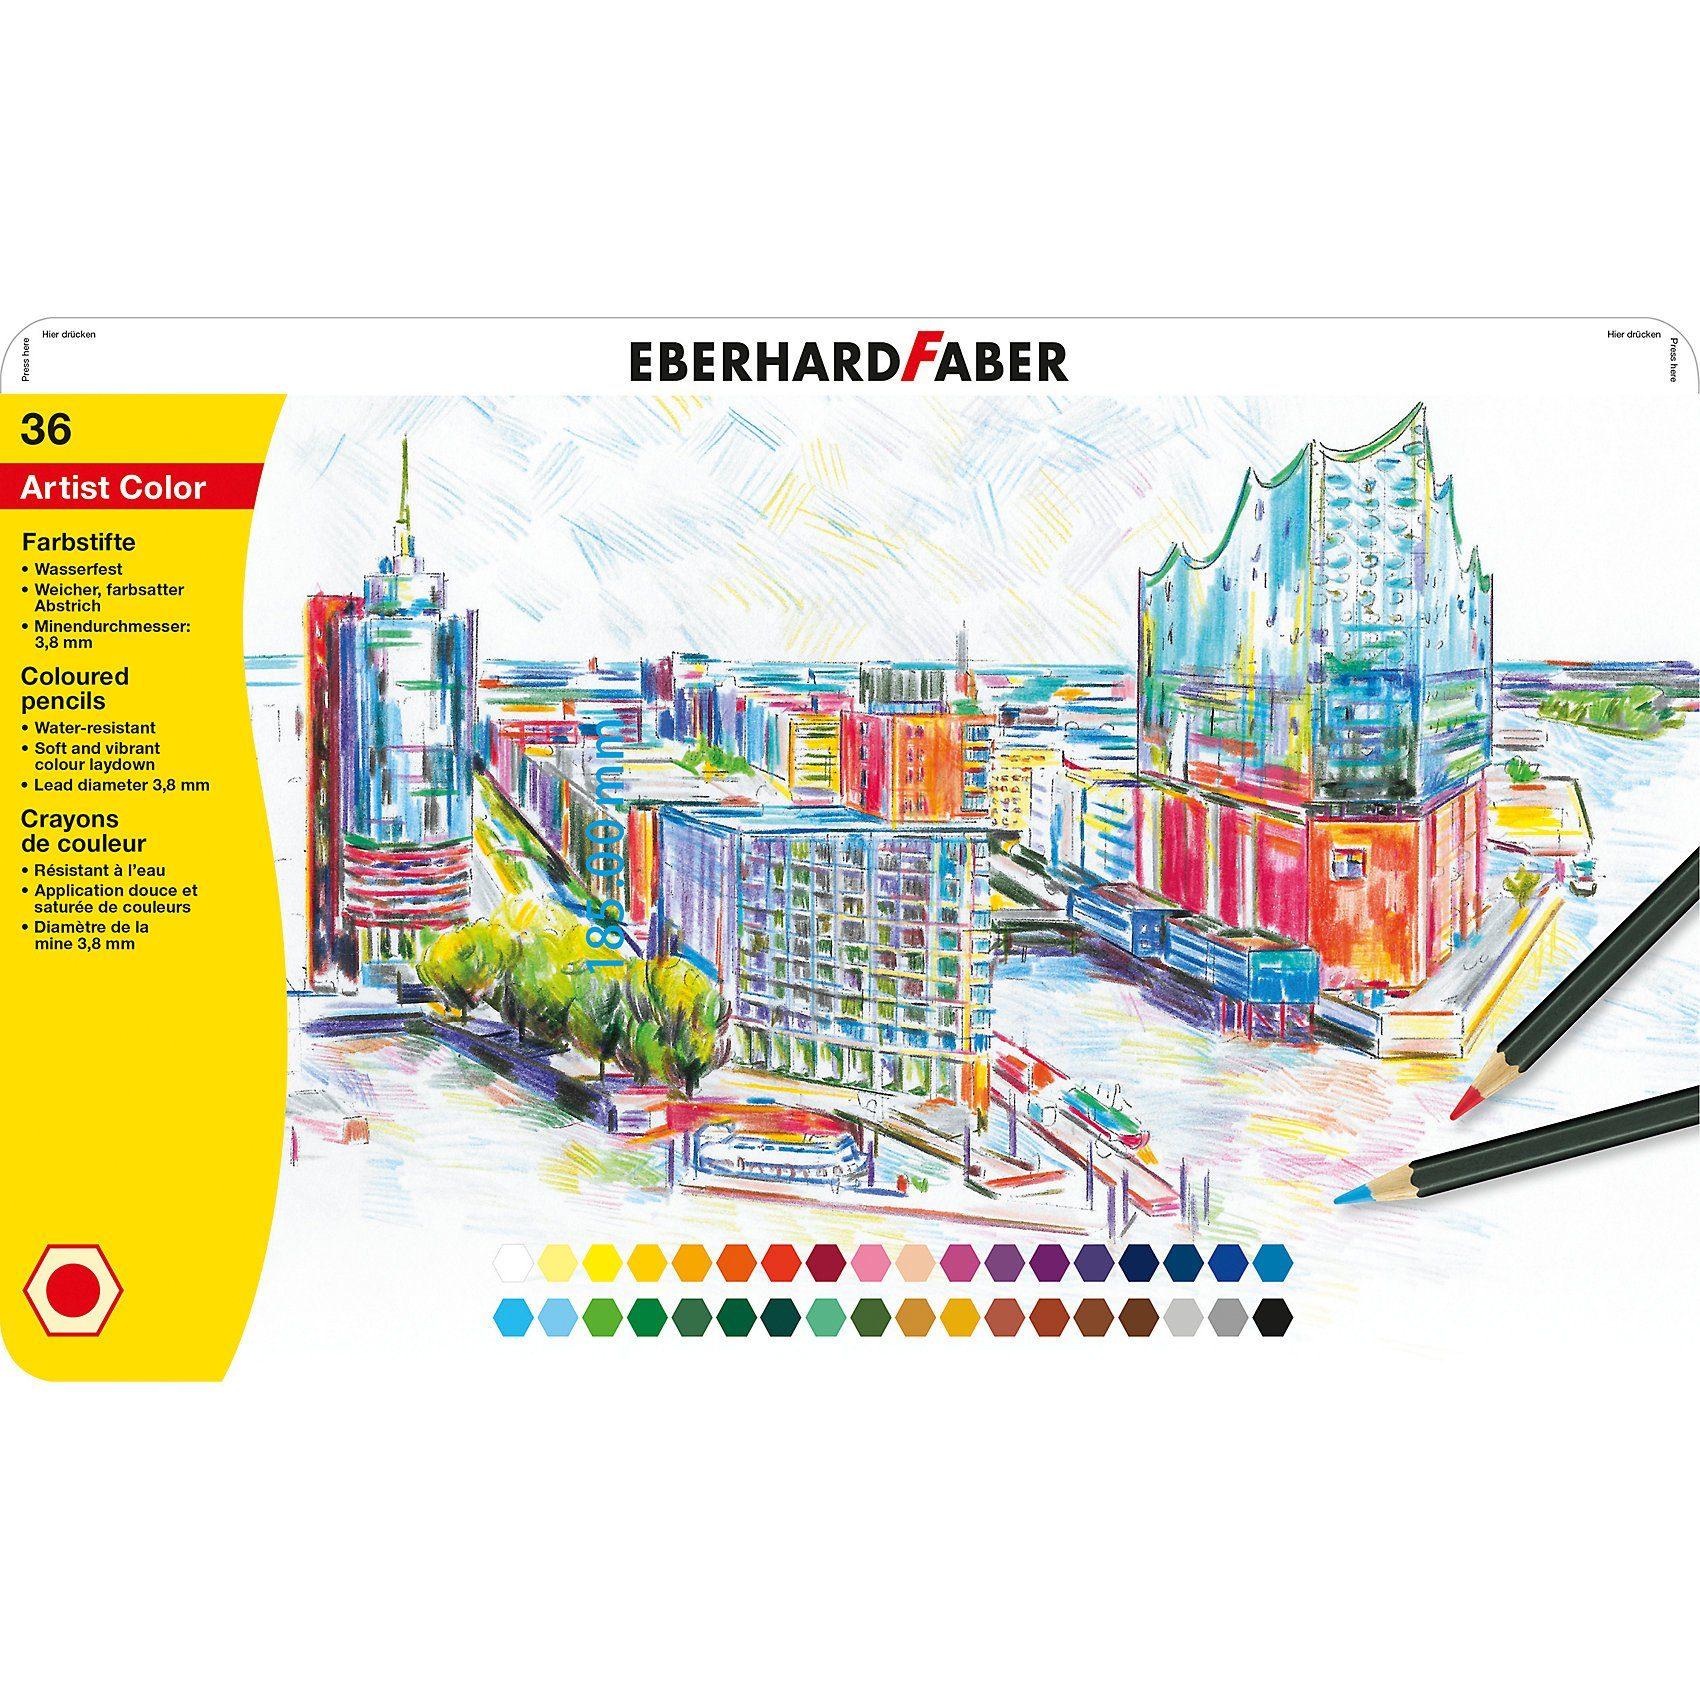 Eberhard Faber Buntstifte Artist Color, 36 Farben